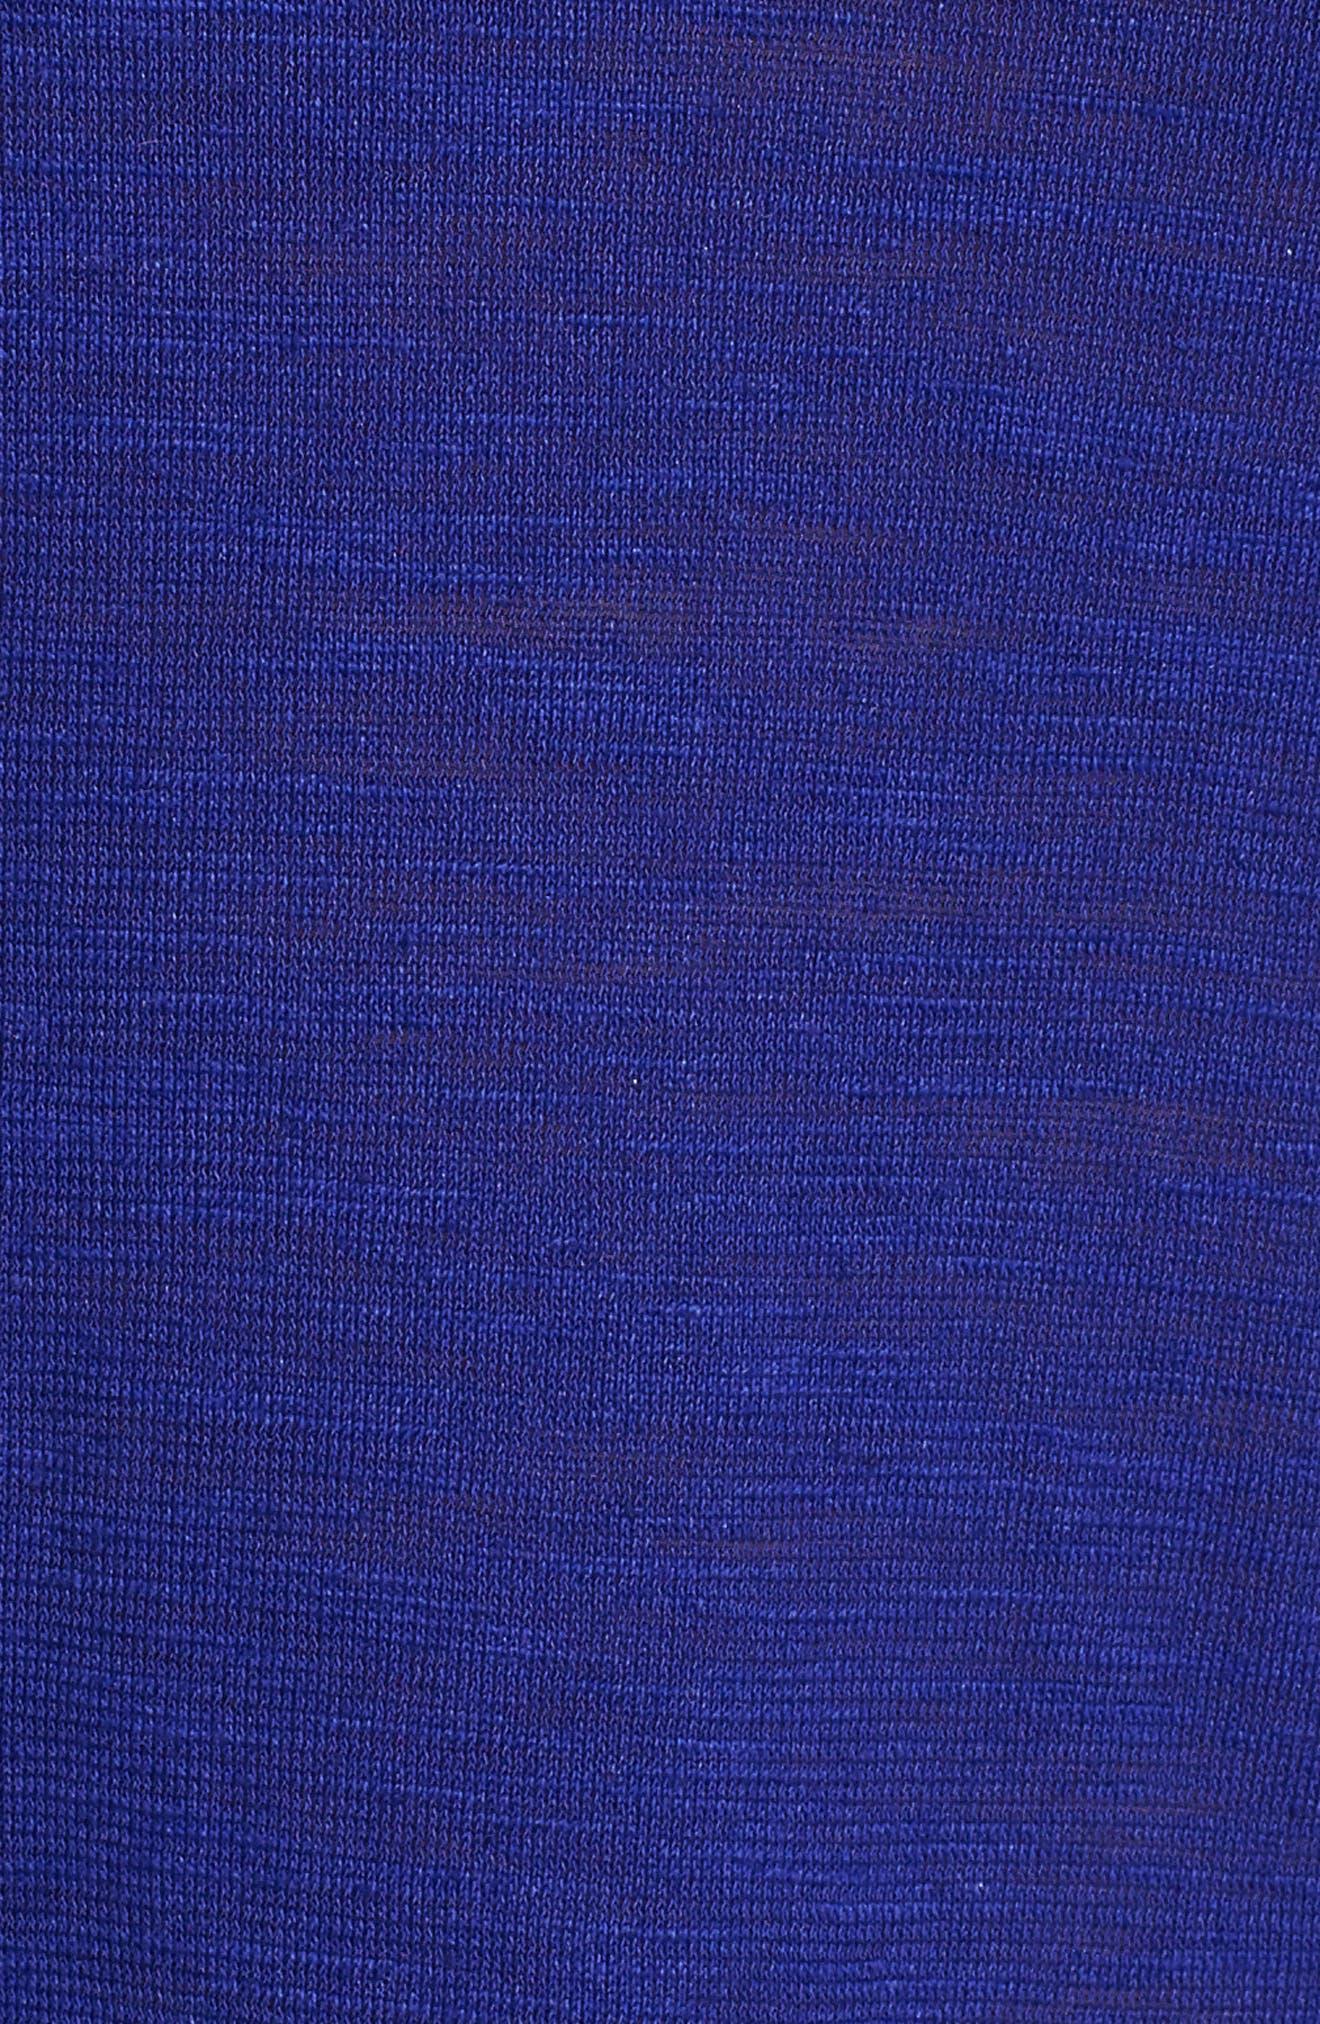 Scooped Neck Hemp & Cotton Midi Dress,                             Alternate thumbnail 5, color,                             Blue Violet